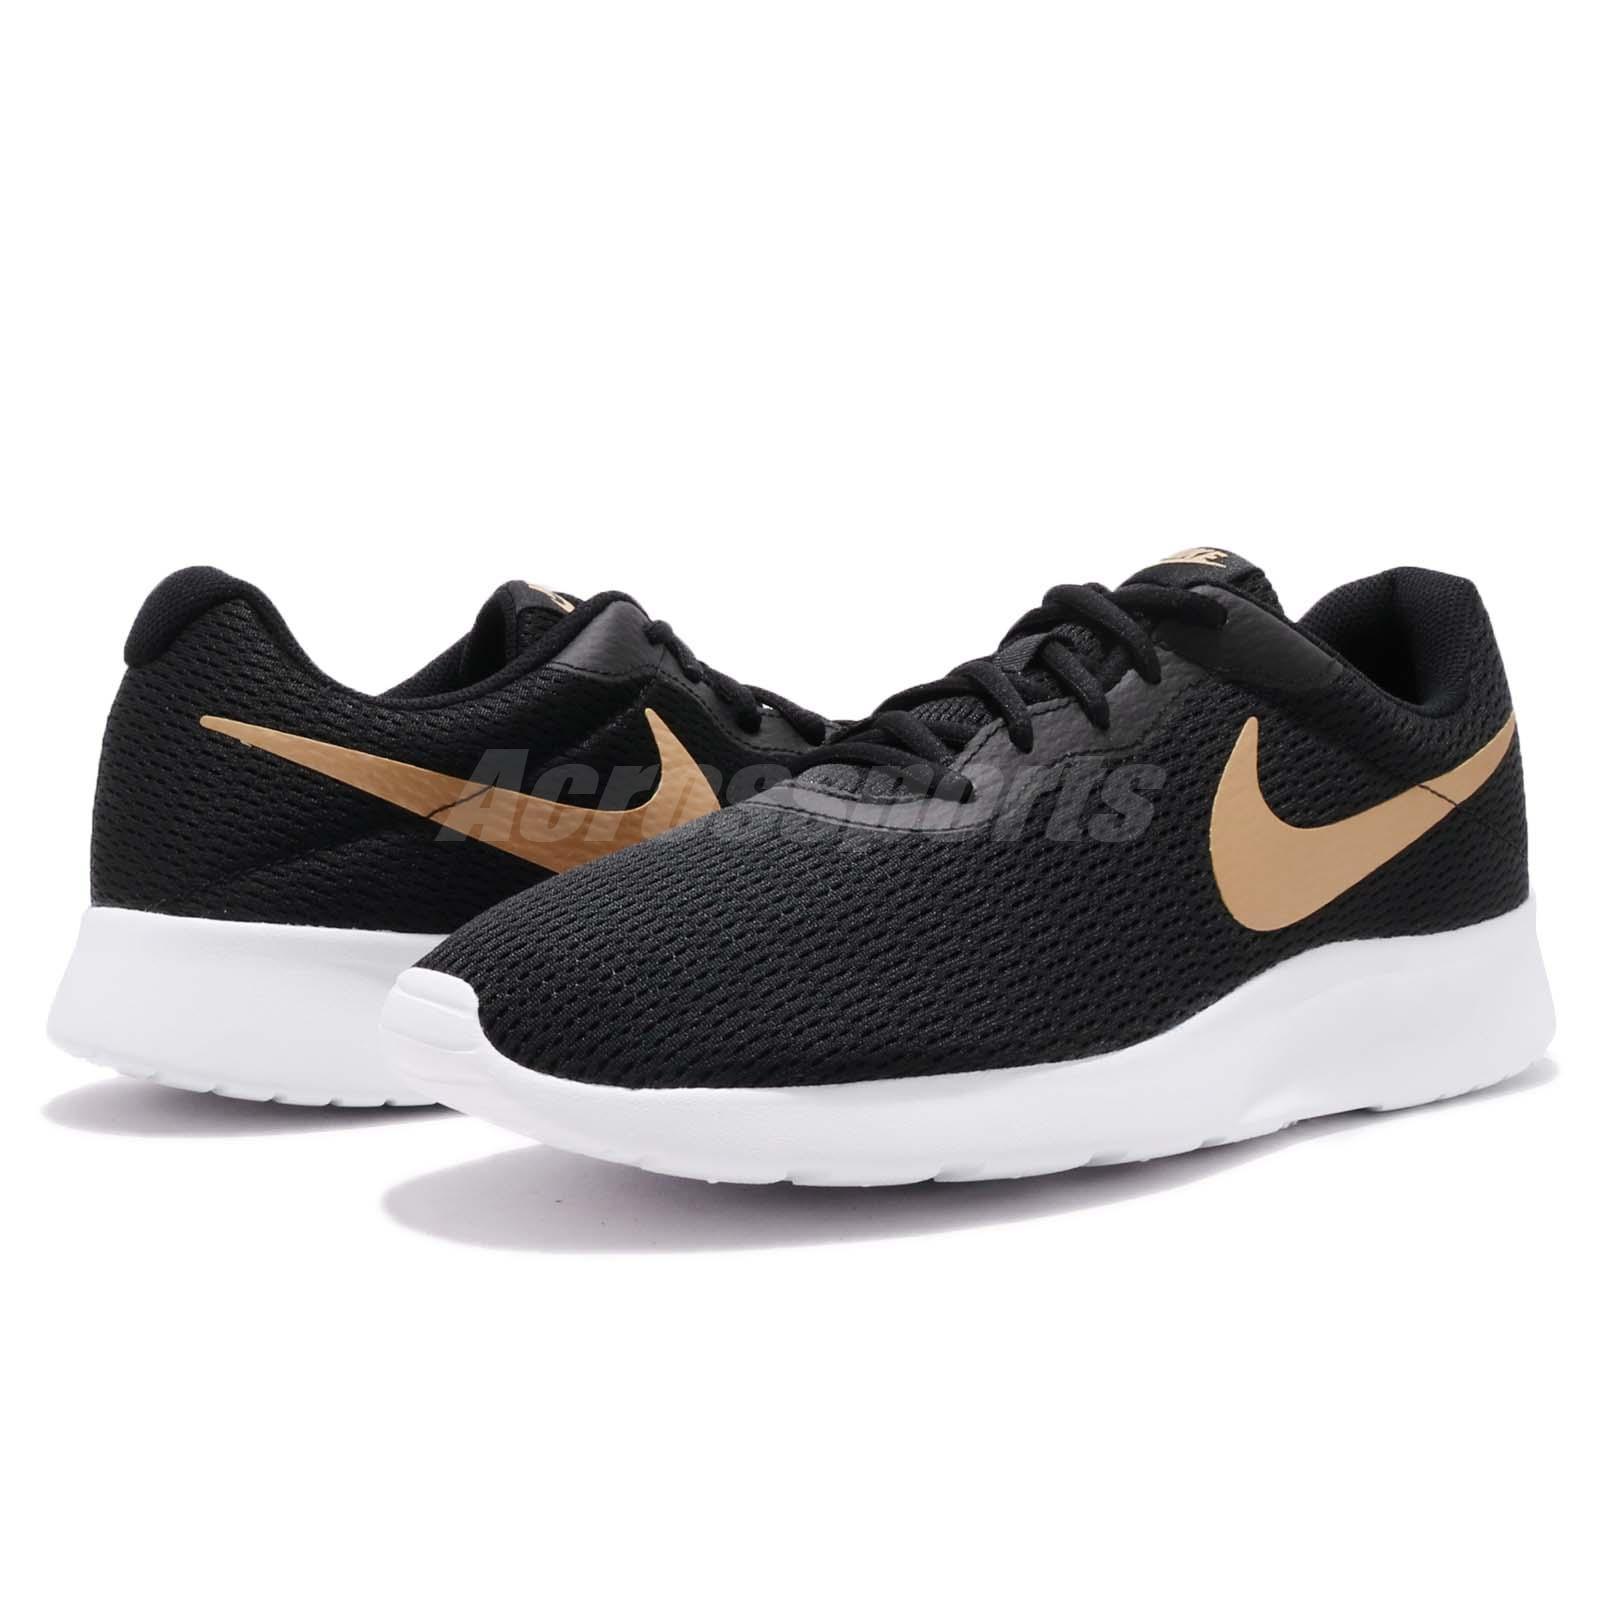 Nike Tanjun Black Gold White Men Running Casual Shoes Sneakers ... 3ae97d1eb1